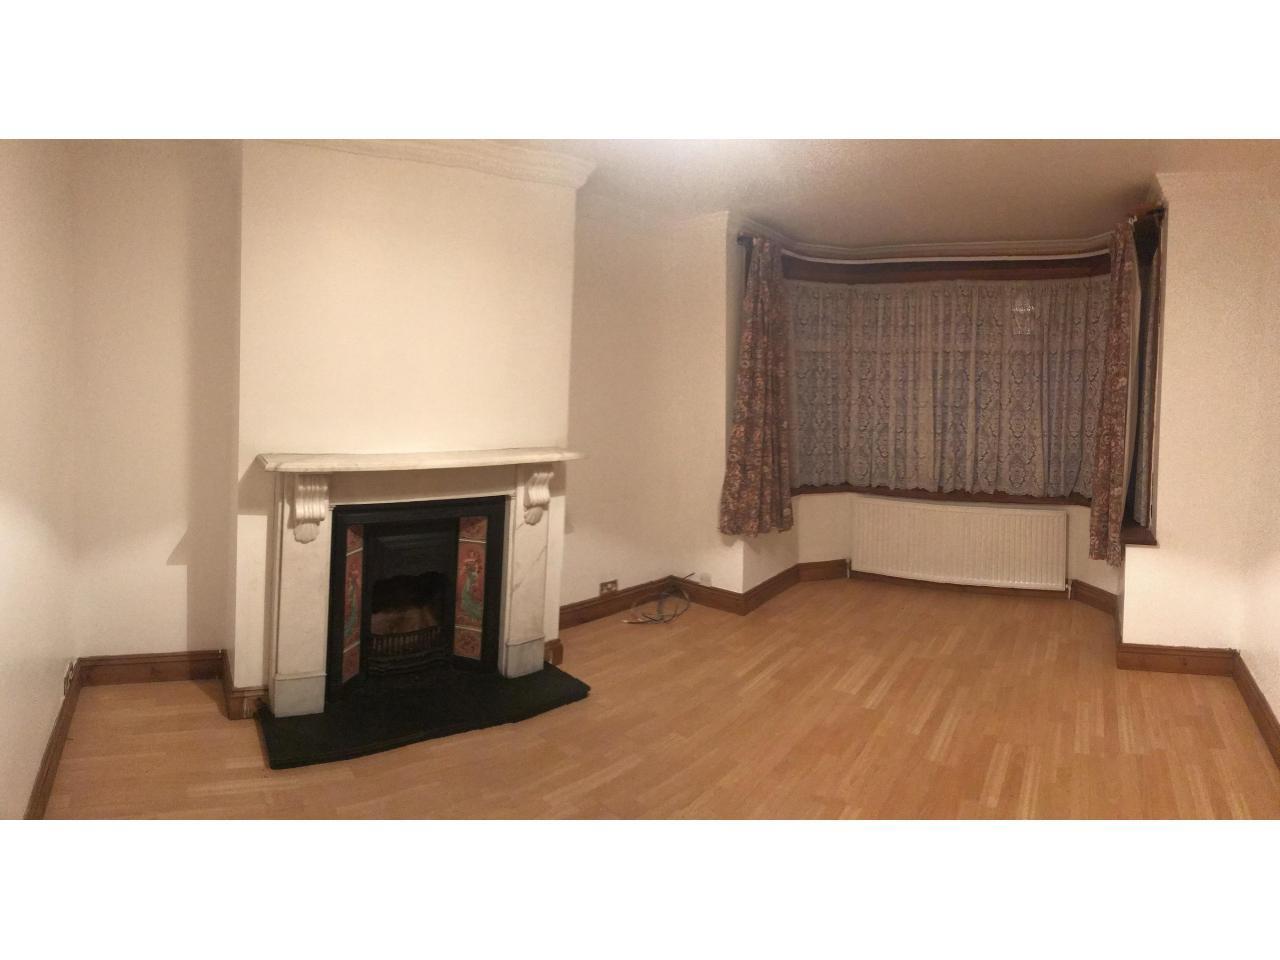 Сингл и Дабл комнаты в аренду на Neasden / Sudbury Hill / Harrow / Greenford. - 4